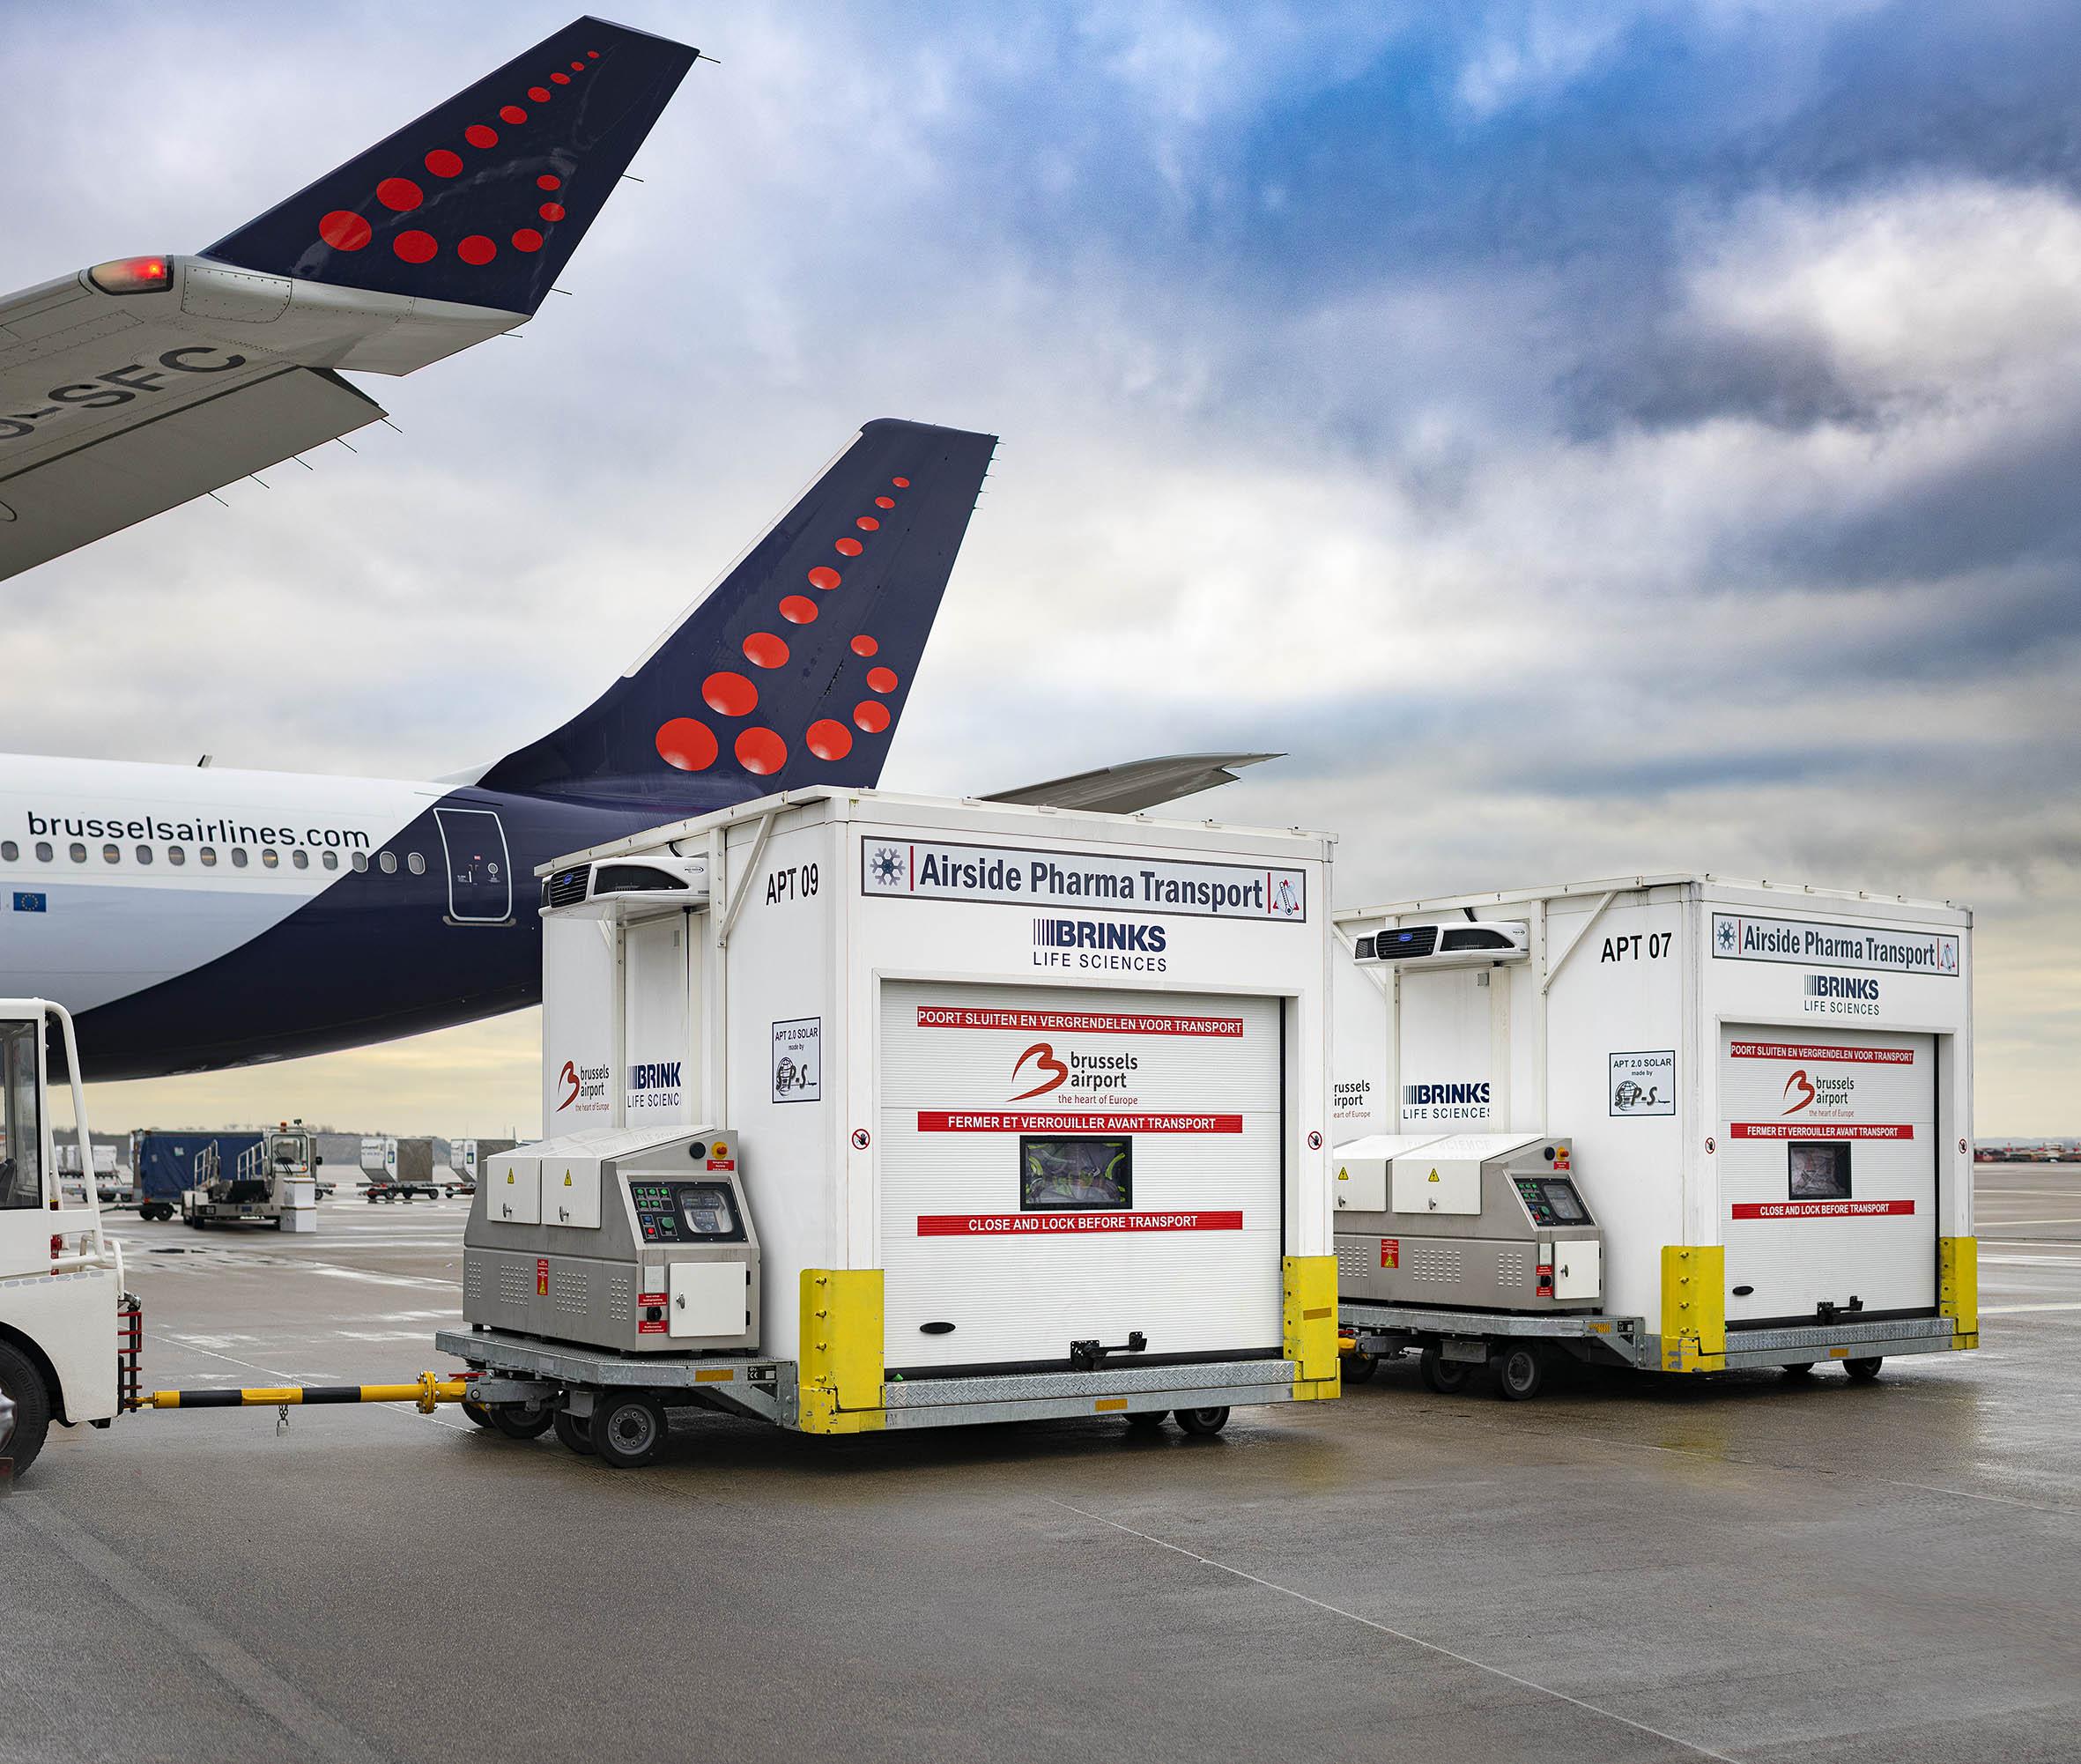 Arthur Los Fotografie - Airside Pharma Transport